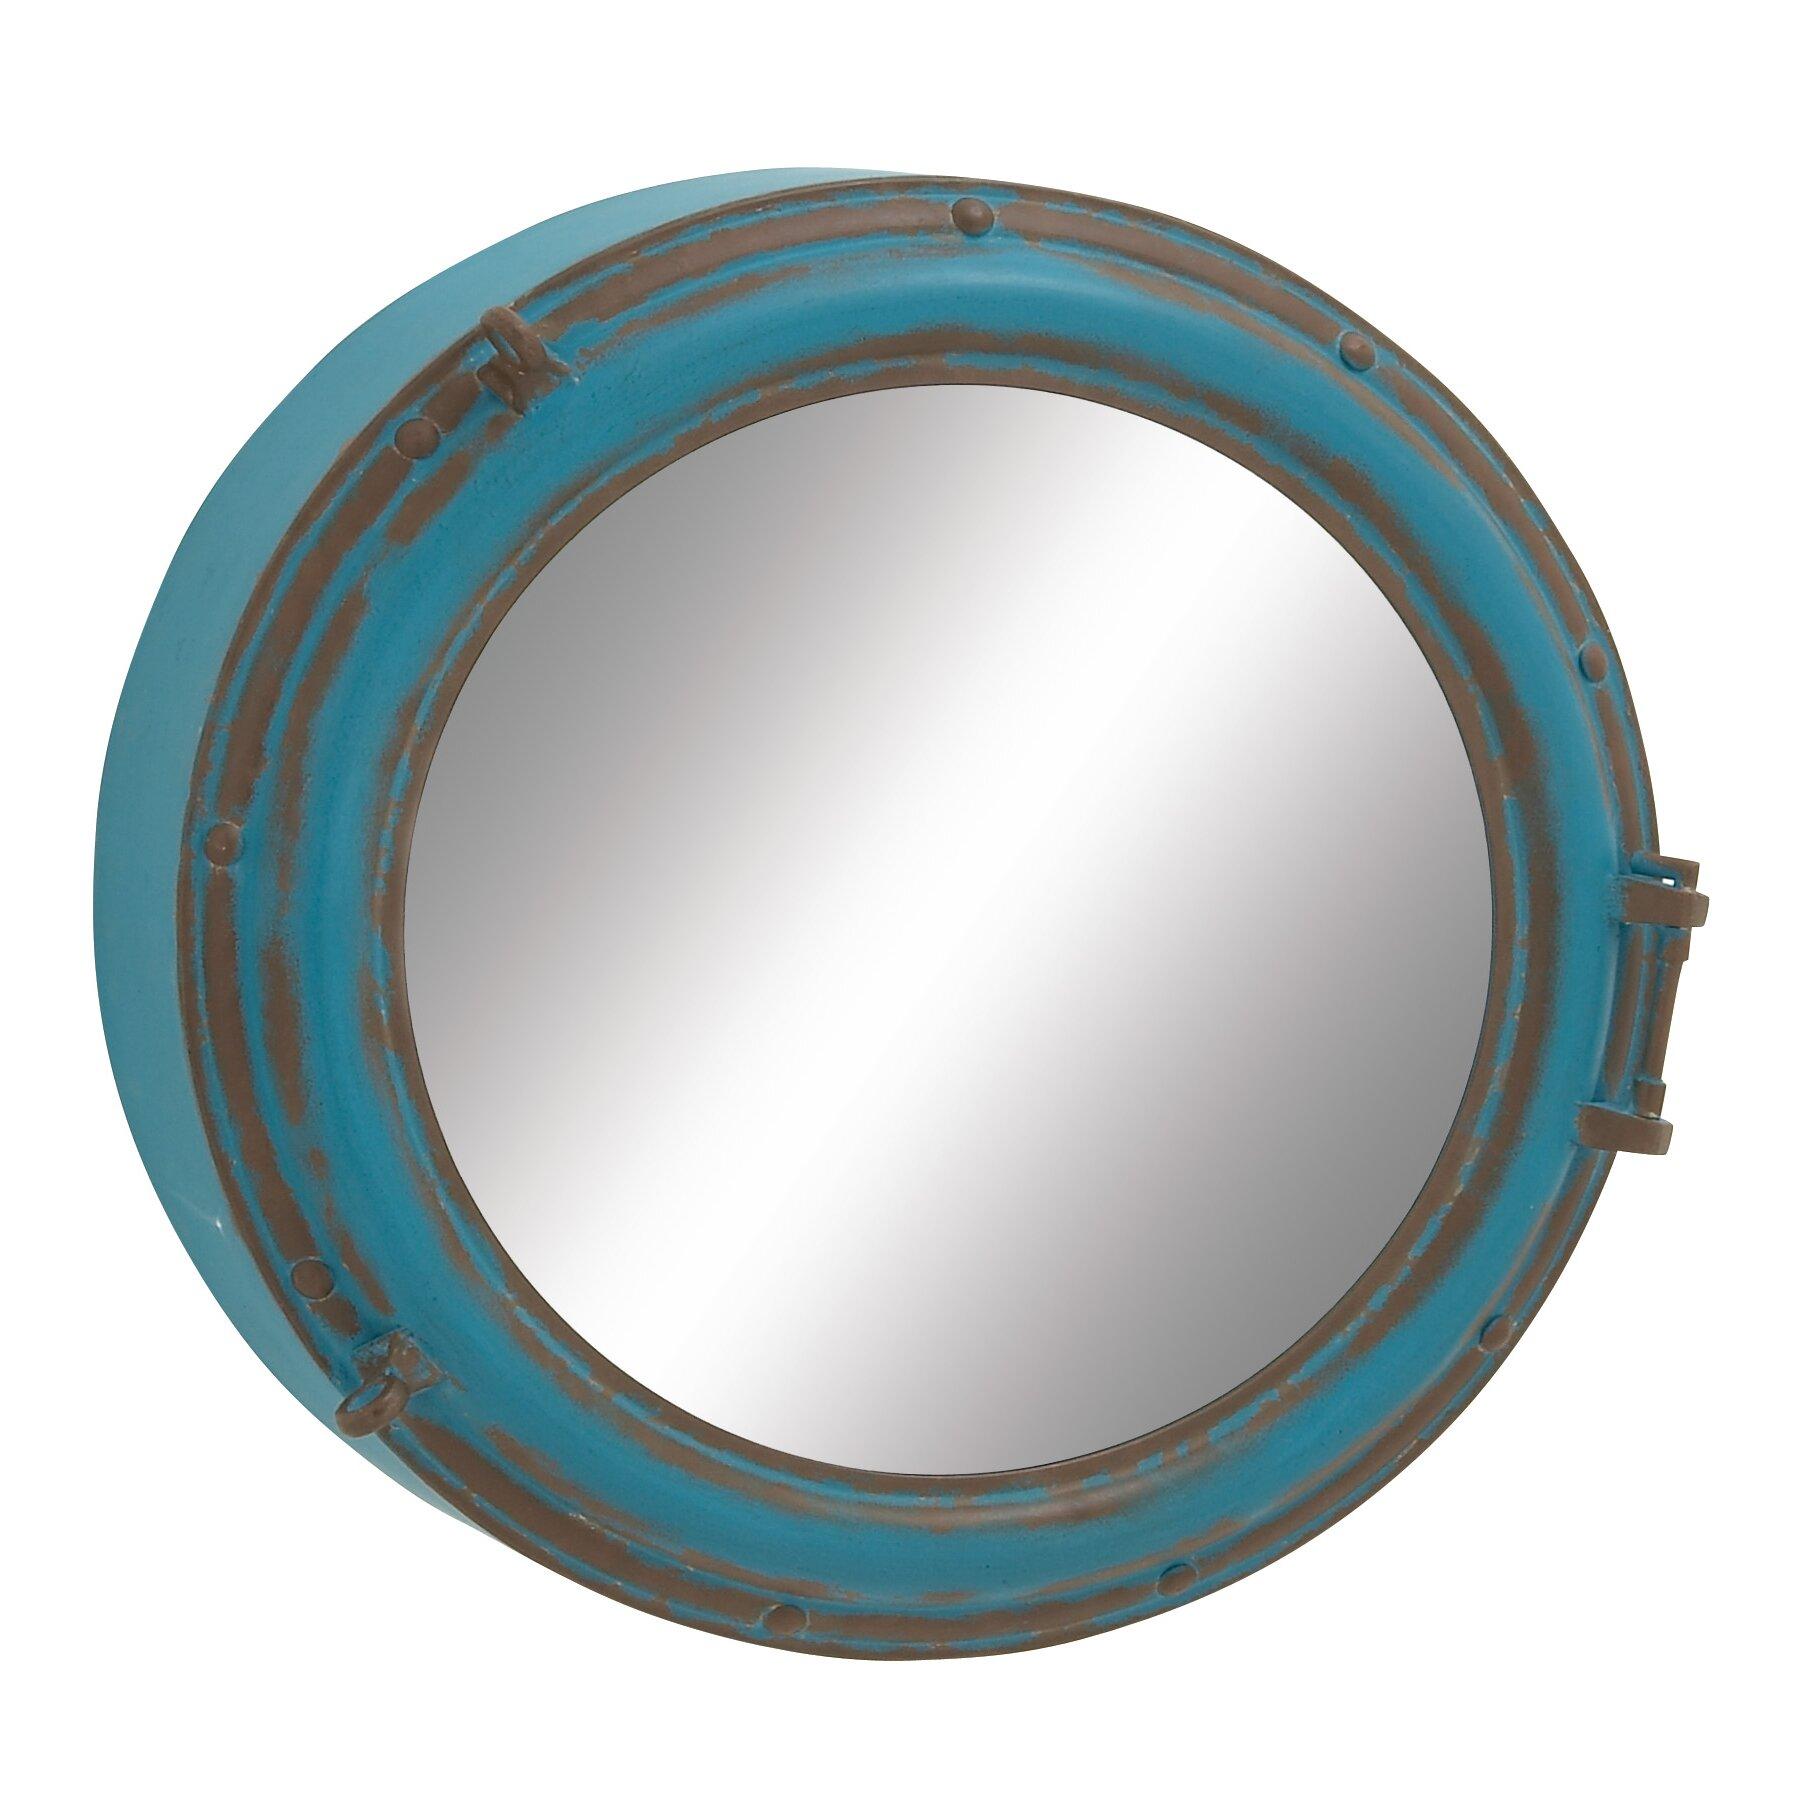 Breakwater bay prescott round wall mirror reviews wayfair for Prescott mirror